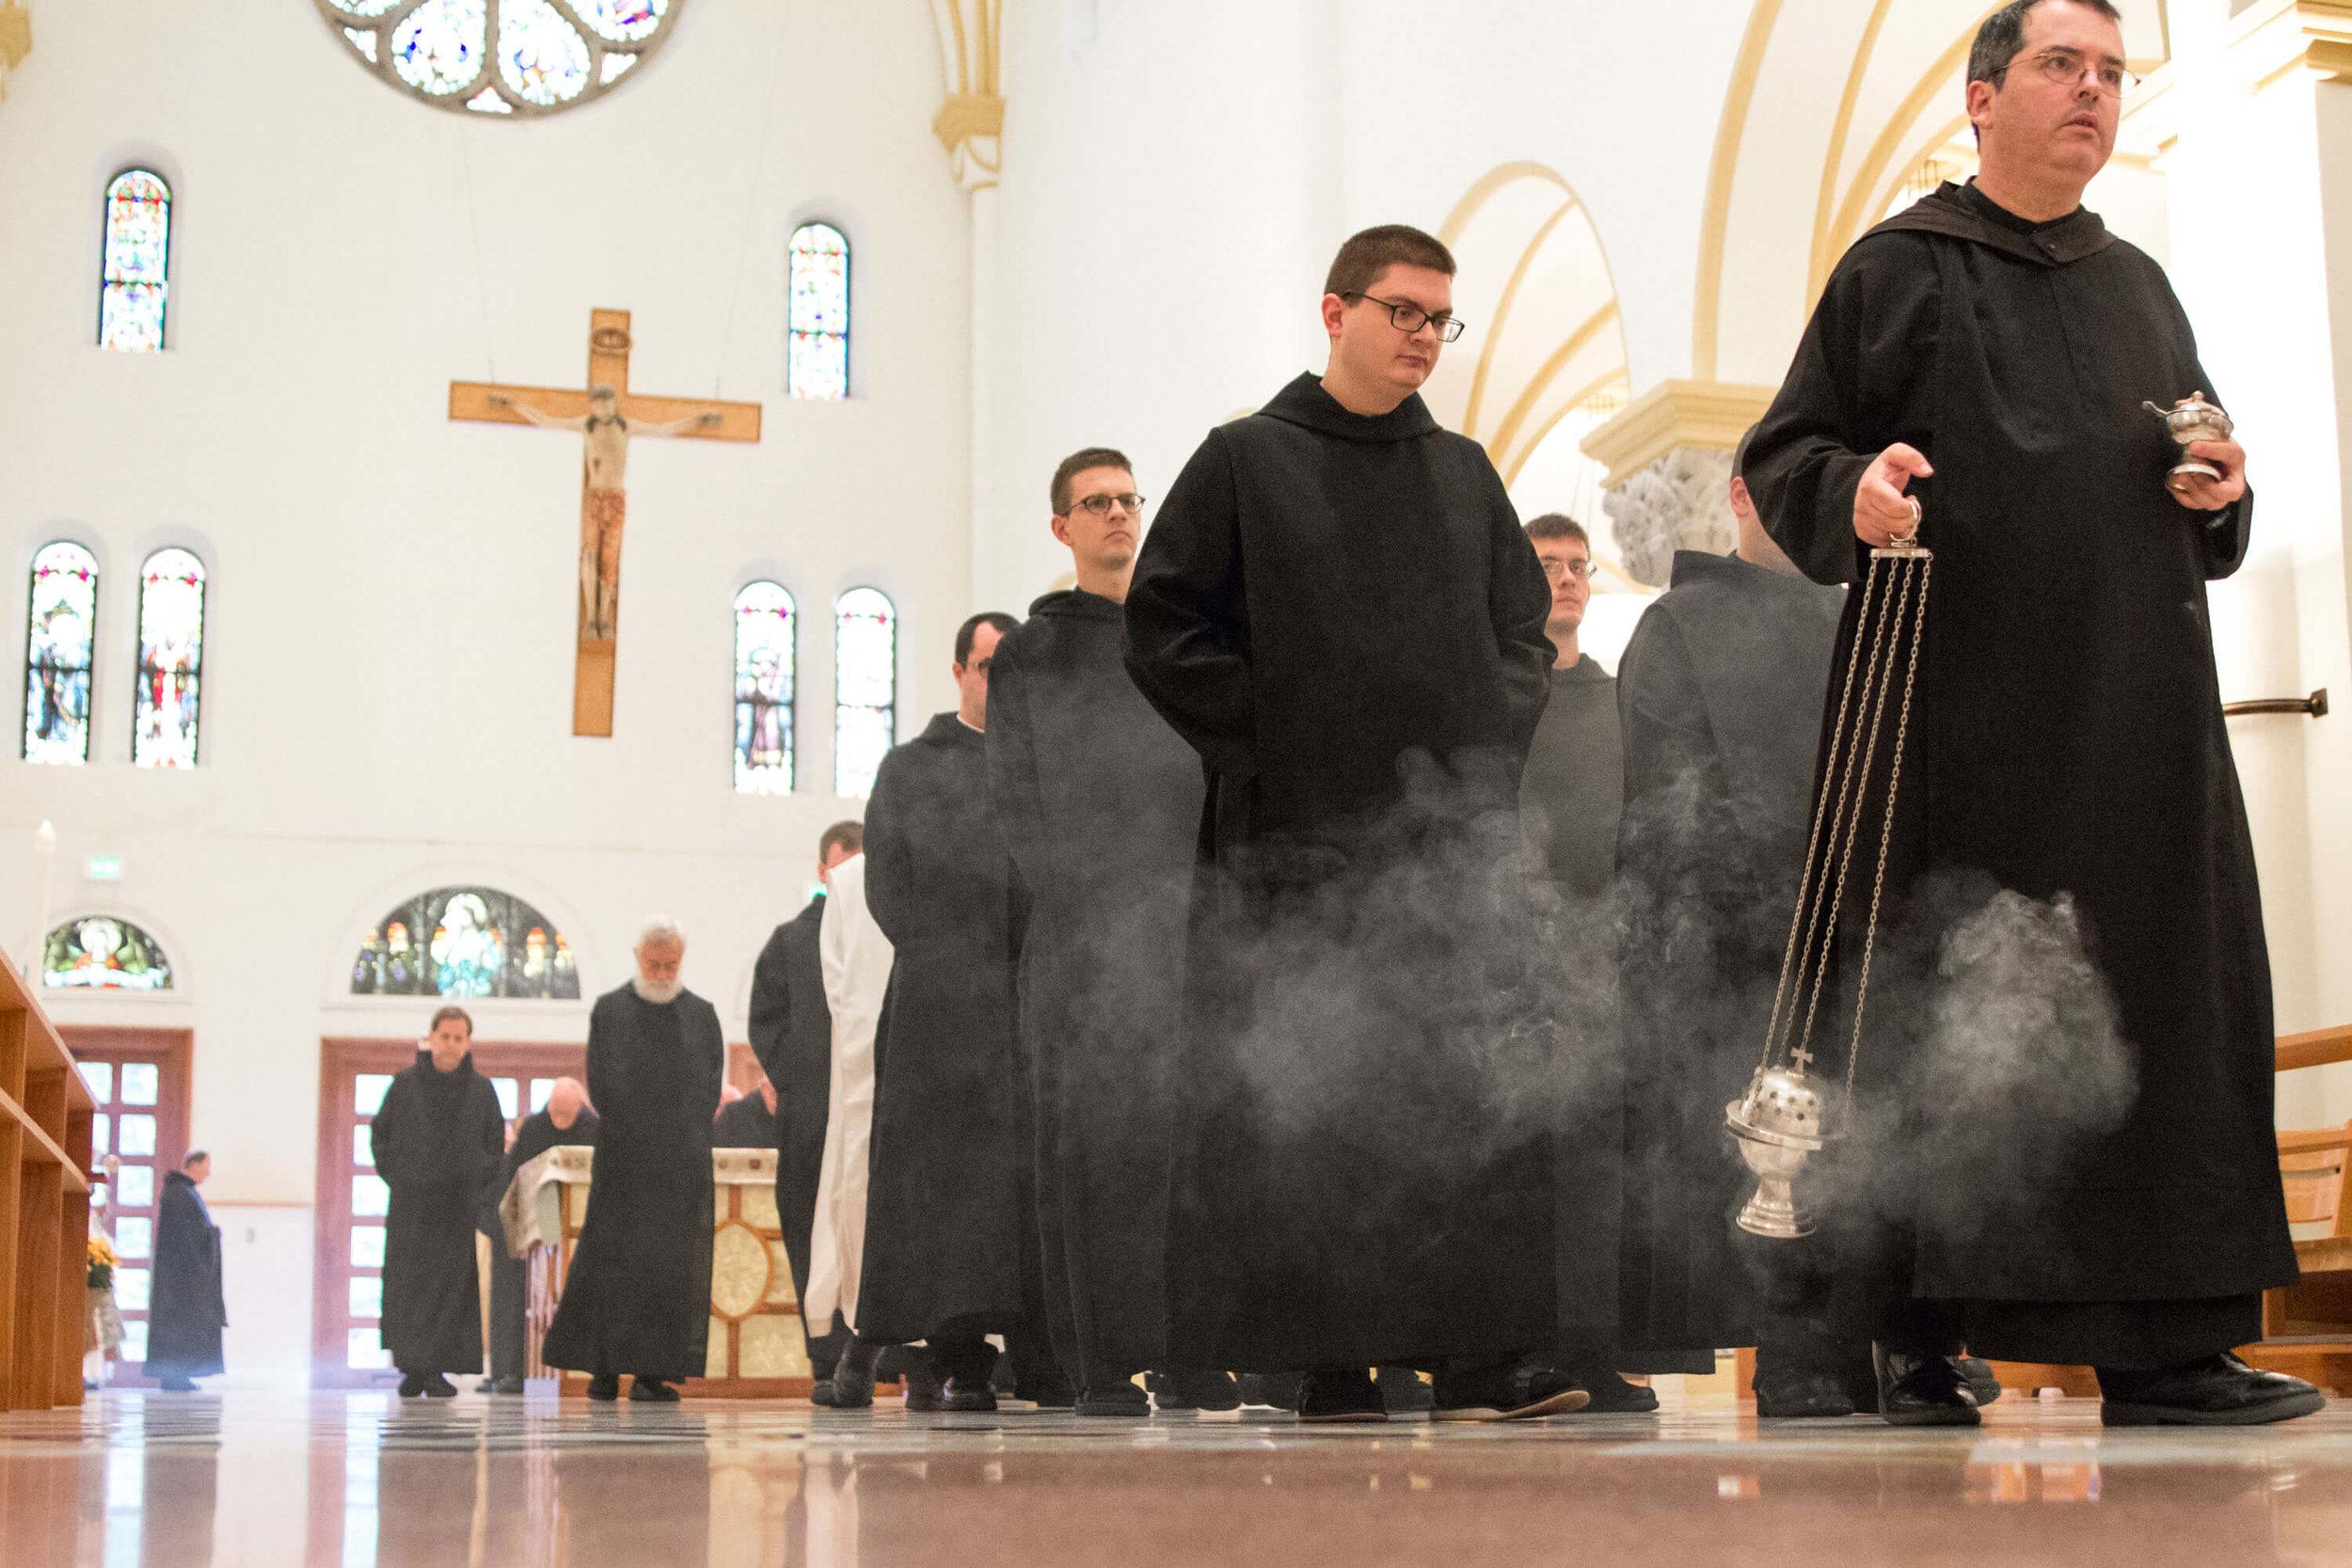 The Benedictine Monks Of Saint Meinrad Archabbey, Saint Meinrad, Indiana